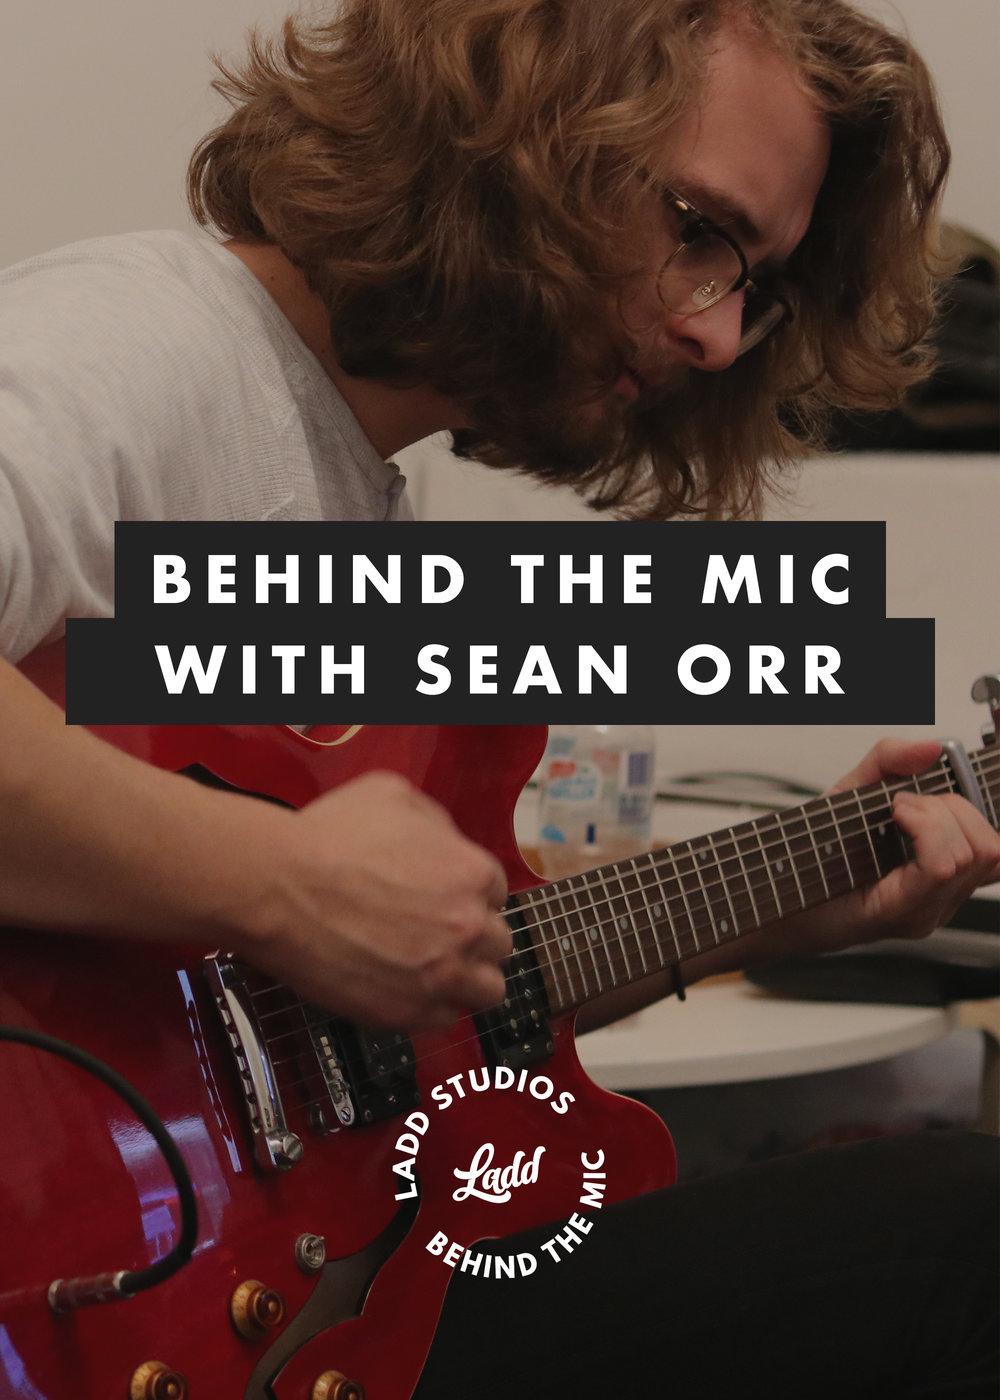 behind-the-mic-with-sean-orr.jpg